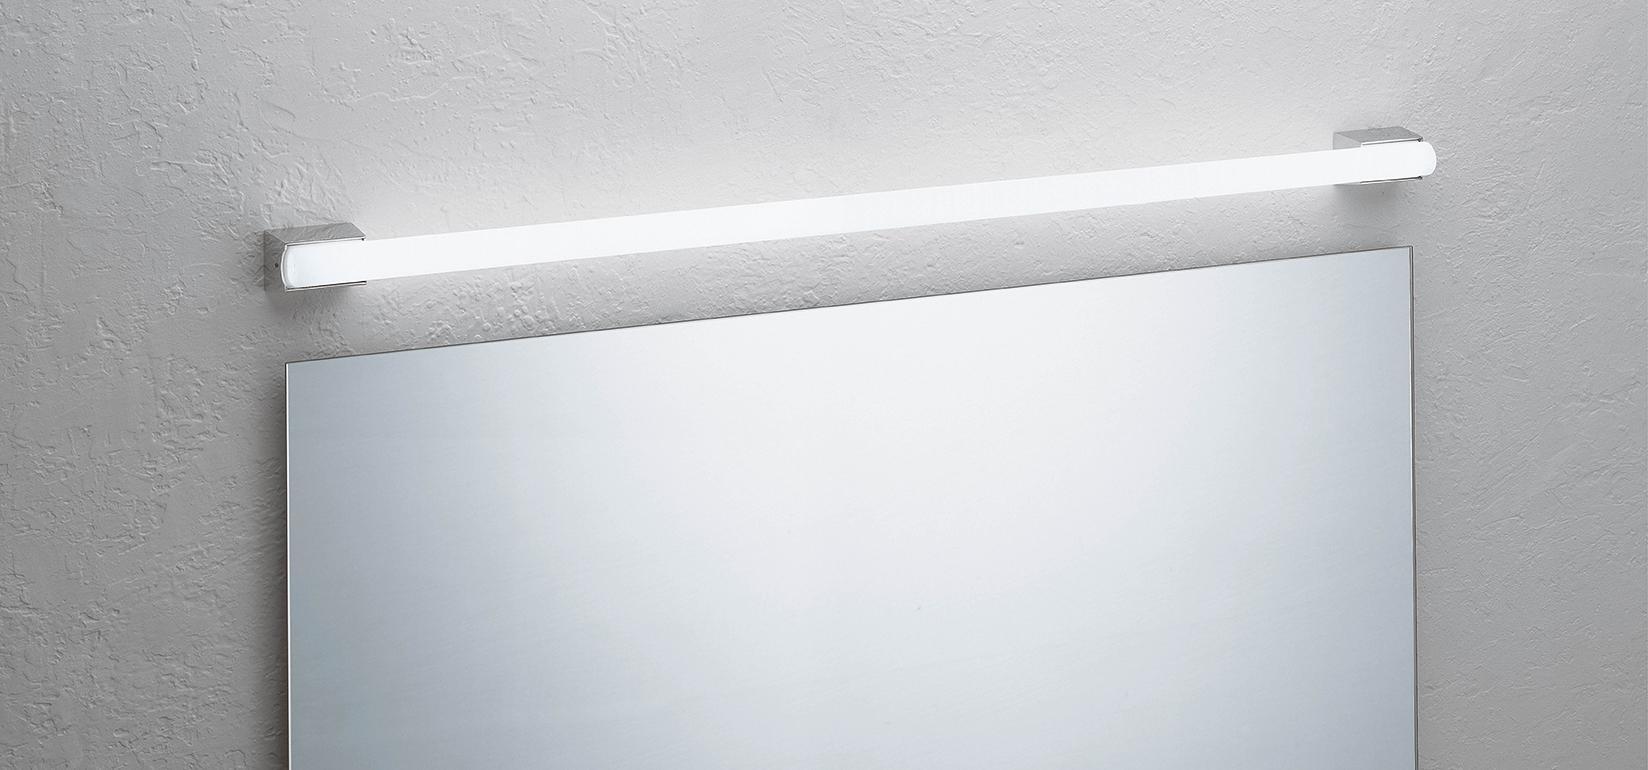 Vibia Spiegelleuchte Linestra, Chrom, Aluminium, 803001